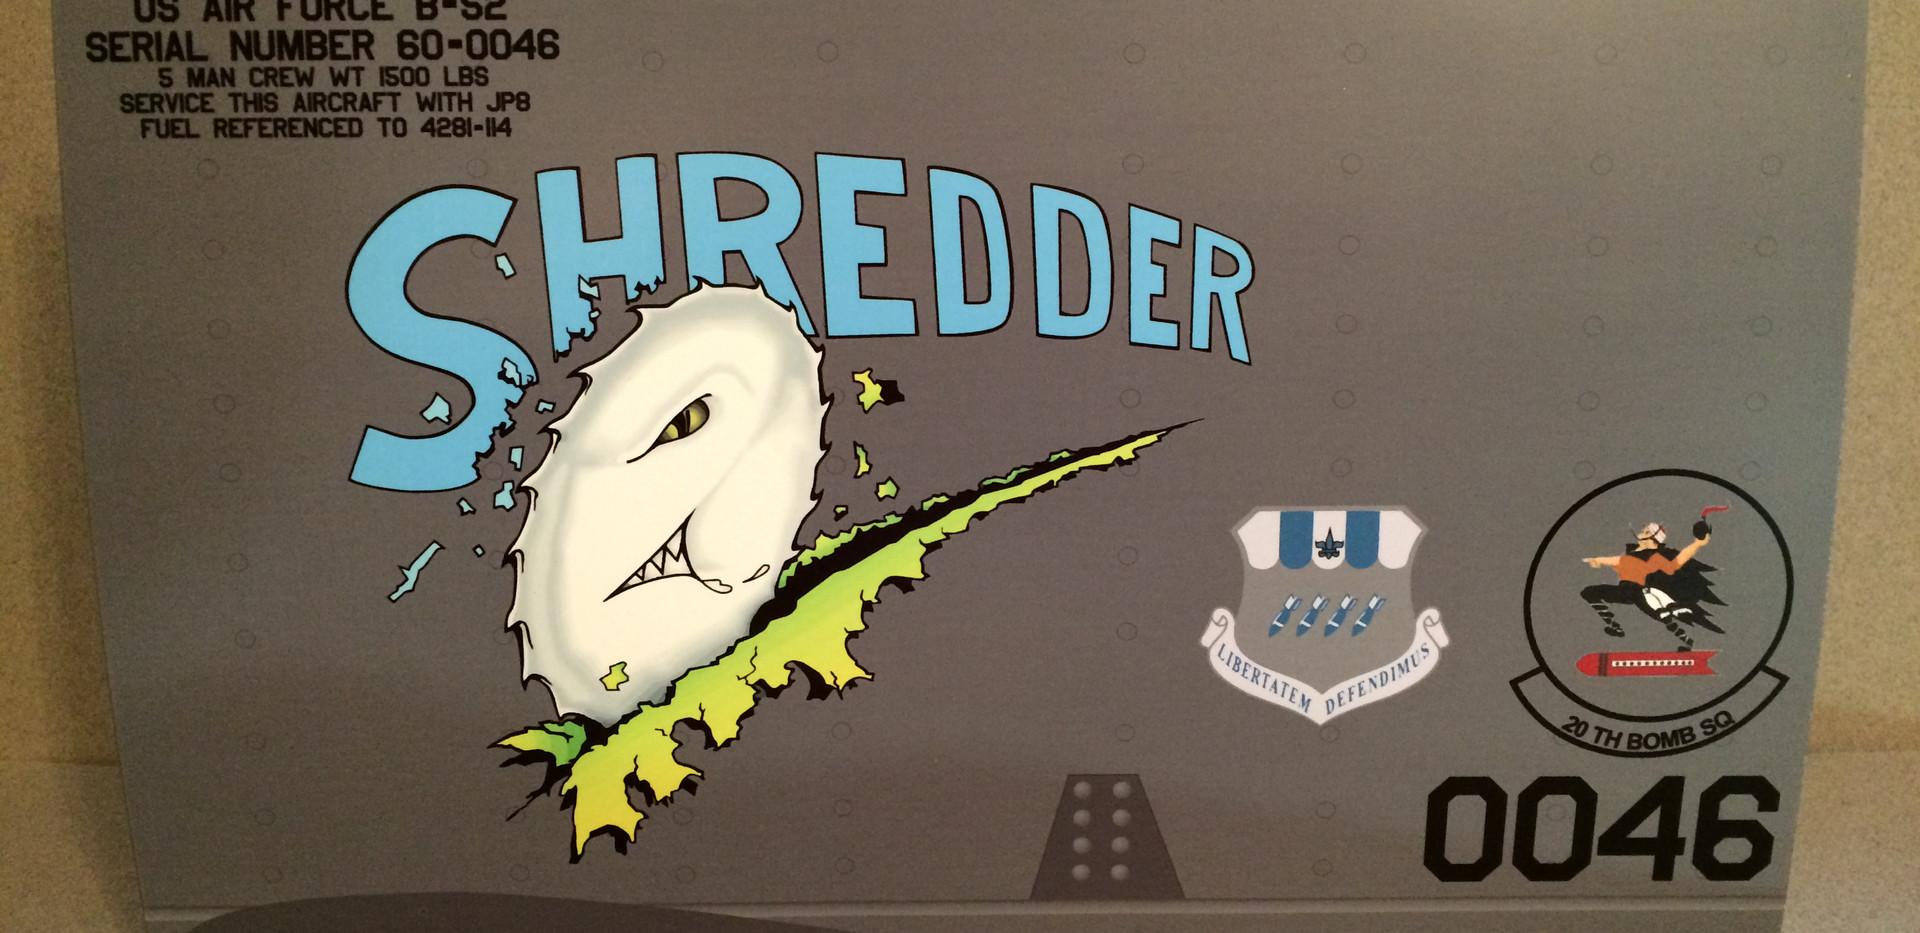 B-52 Shredder